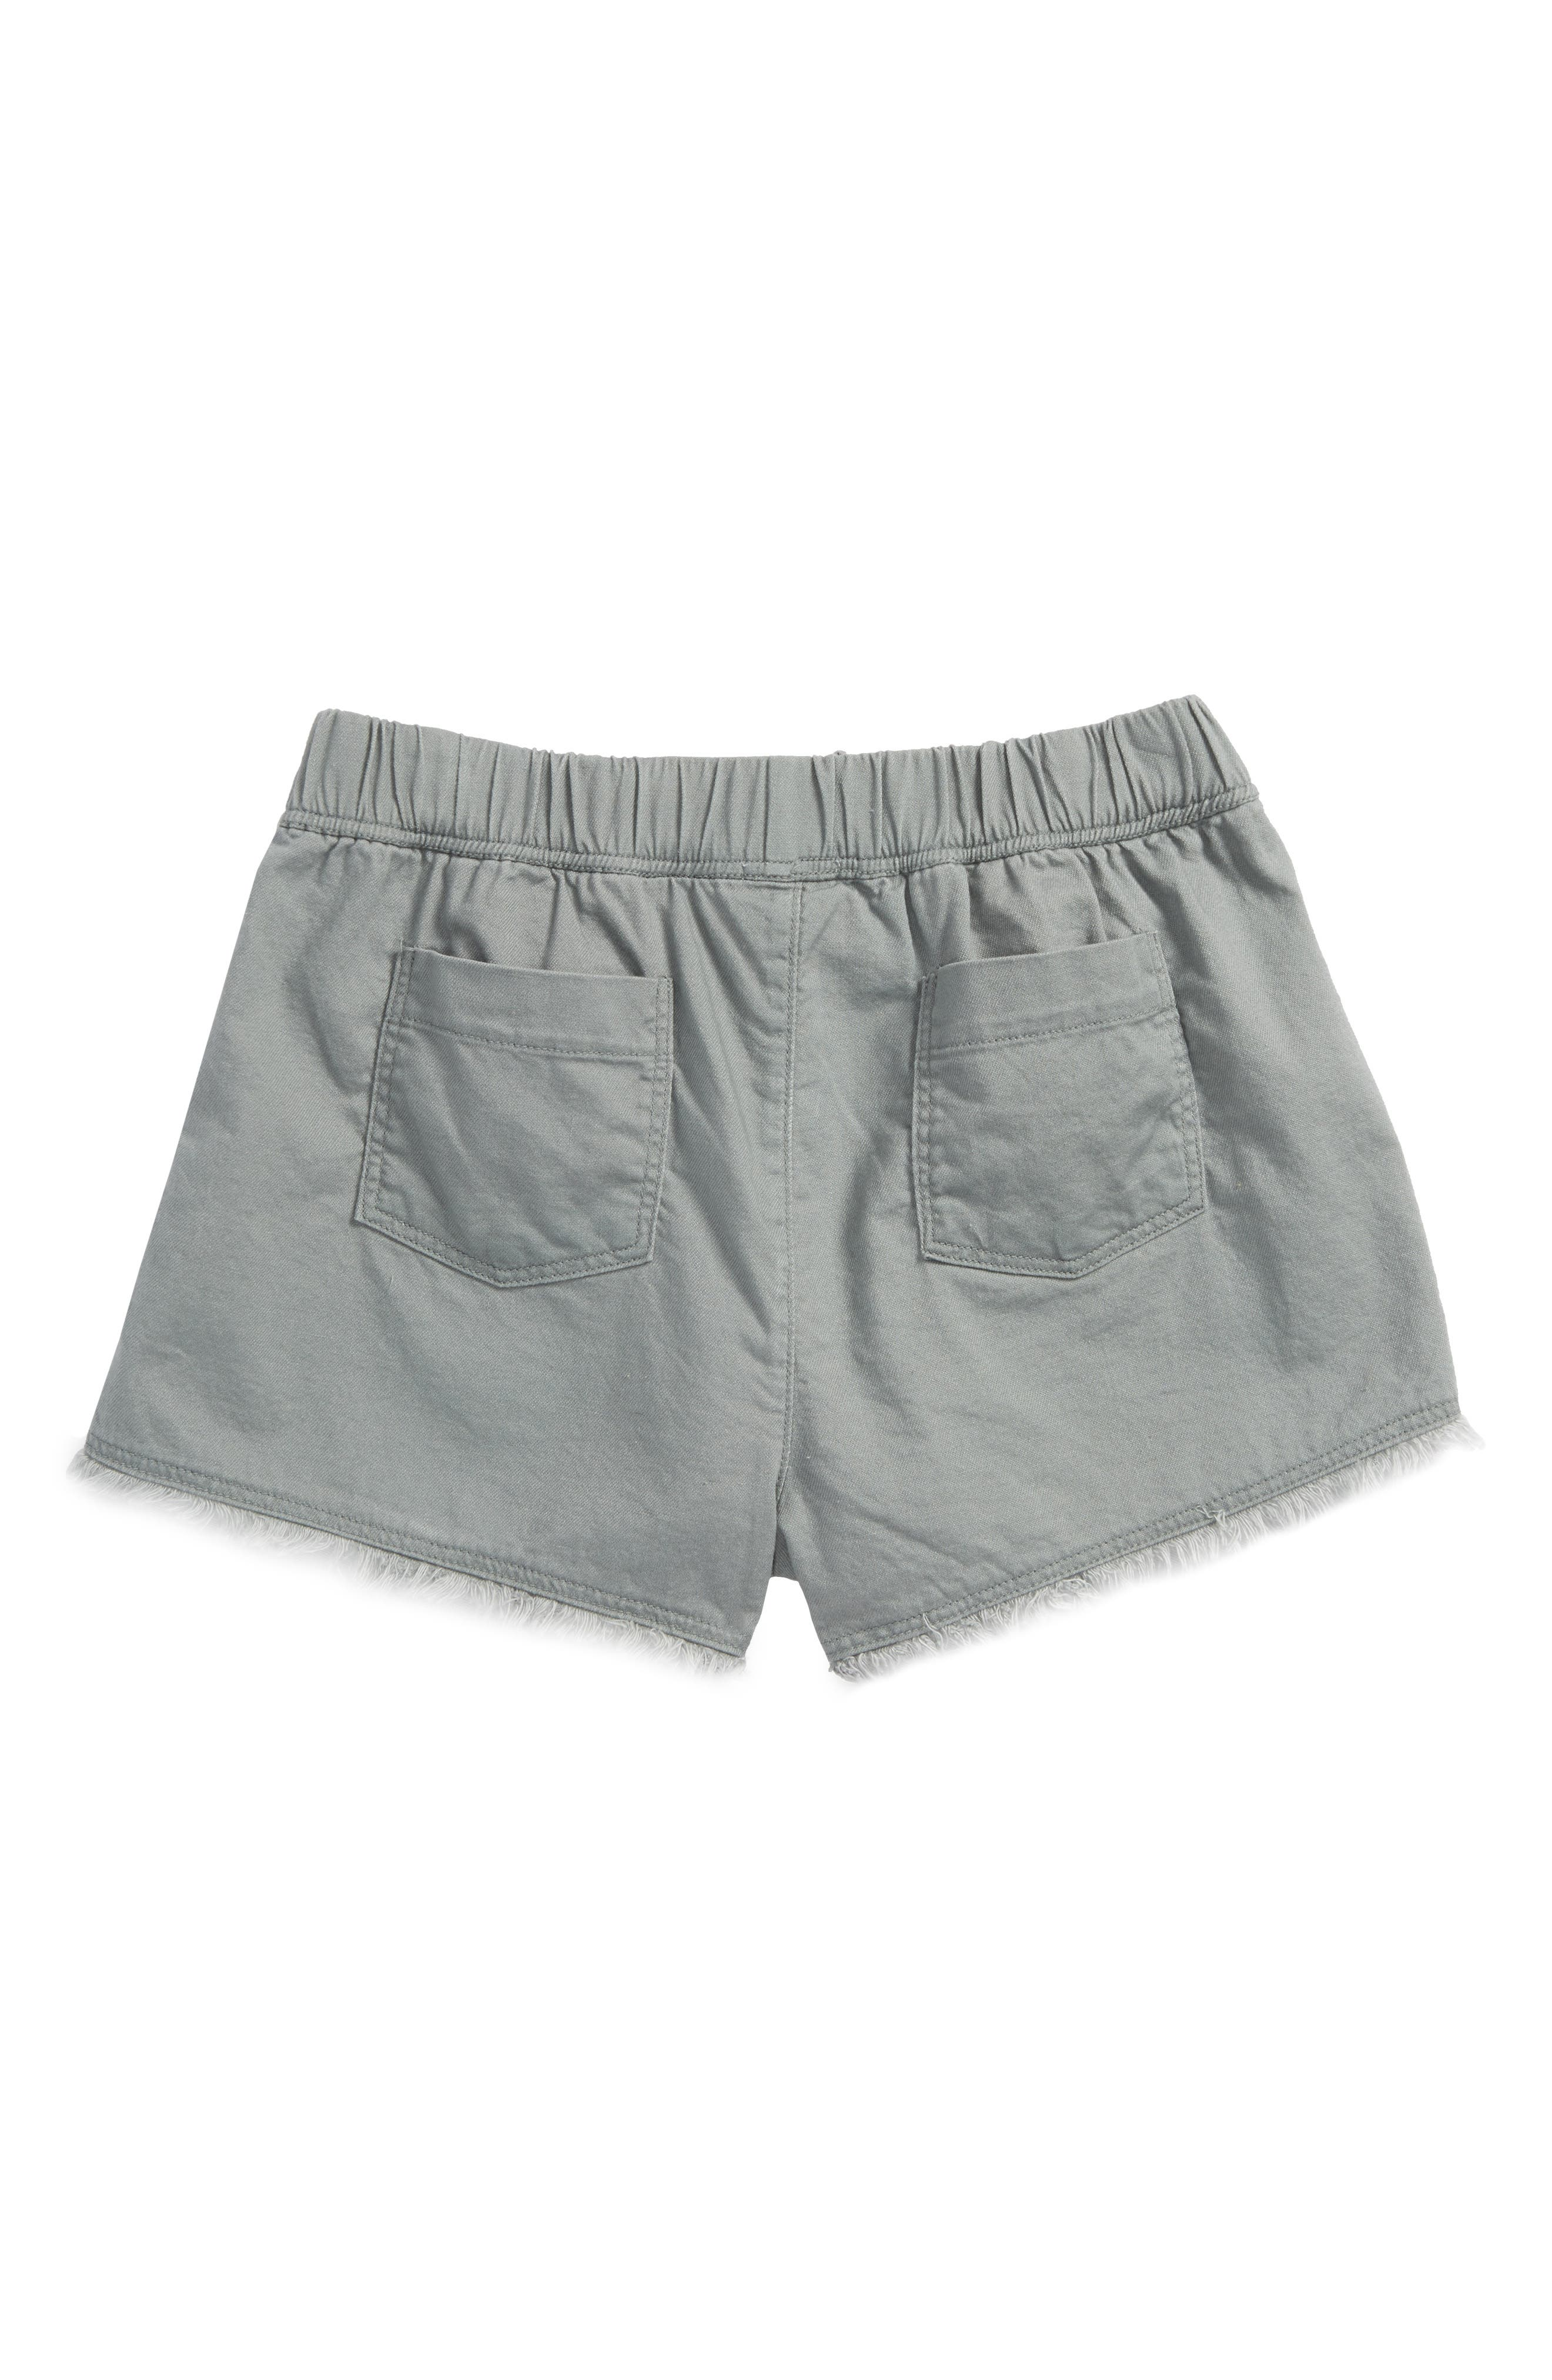 Twill Shorts,                             Alternate thumbnail 2, color,                             250